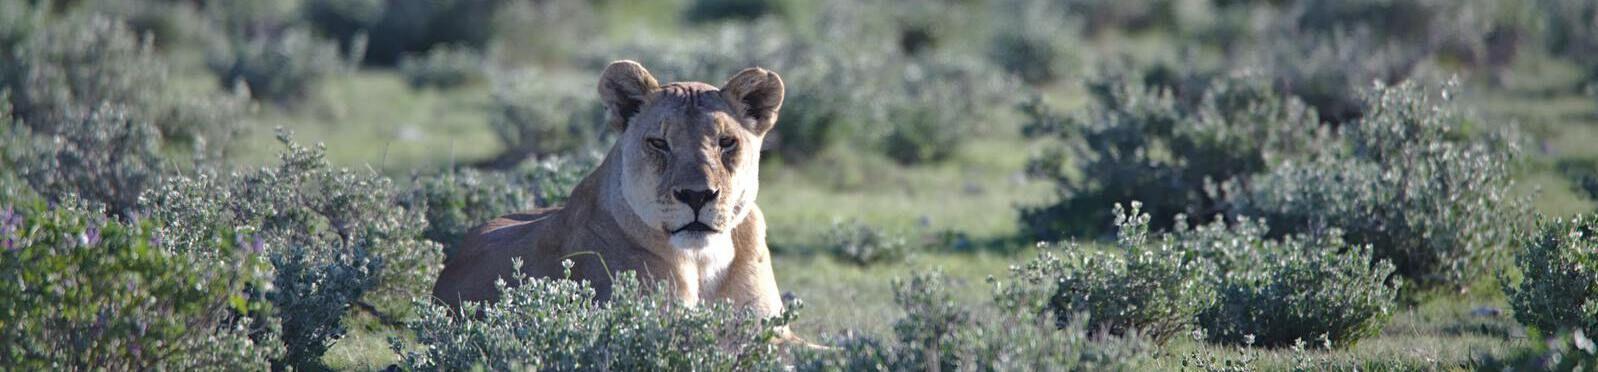 namibia leonessa